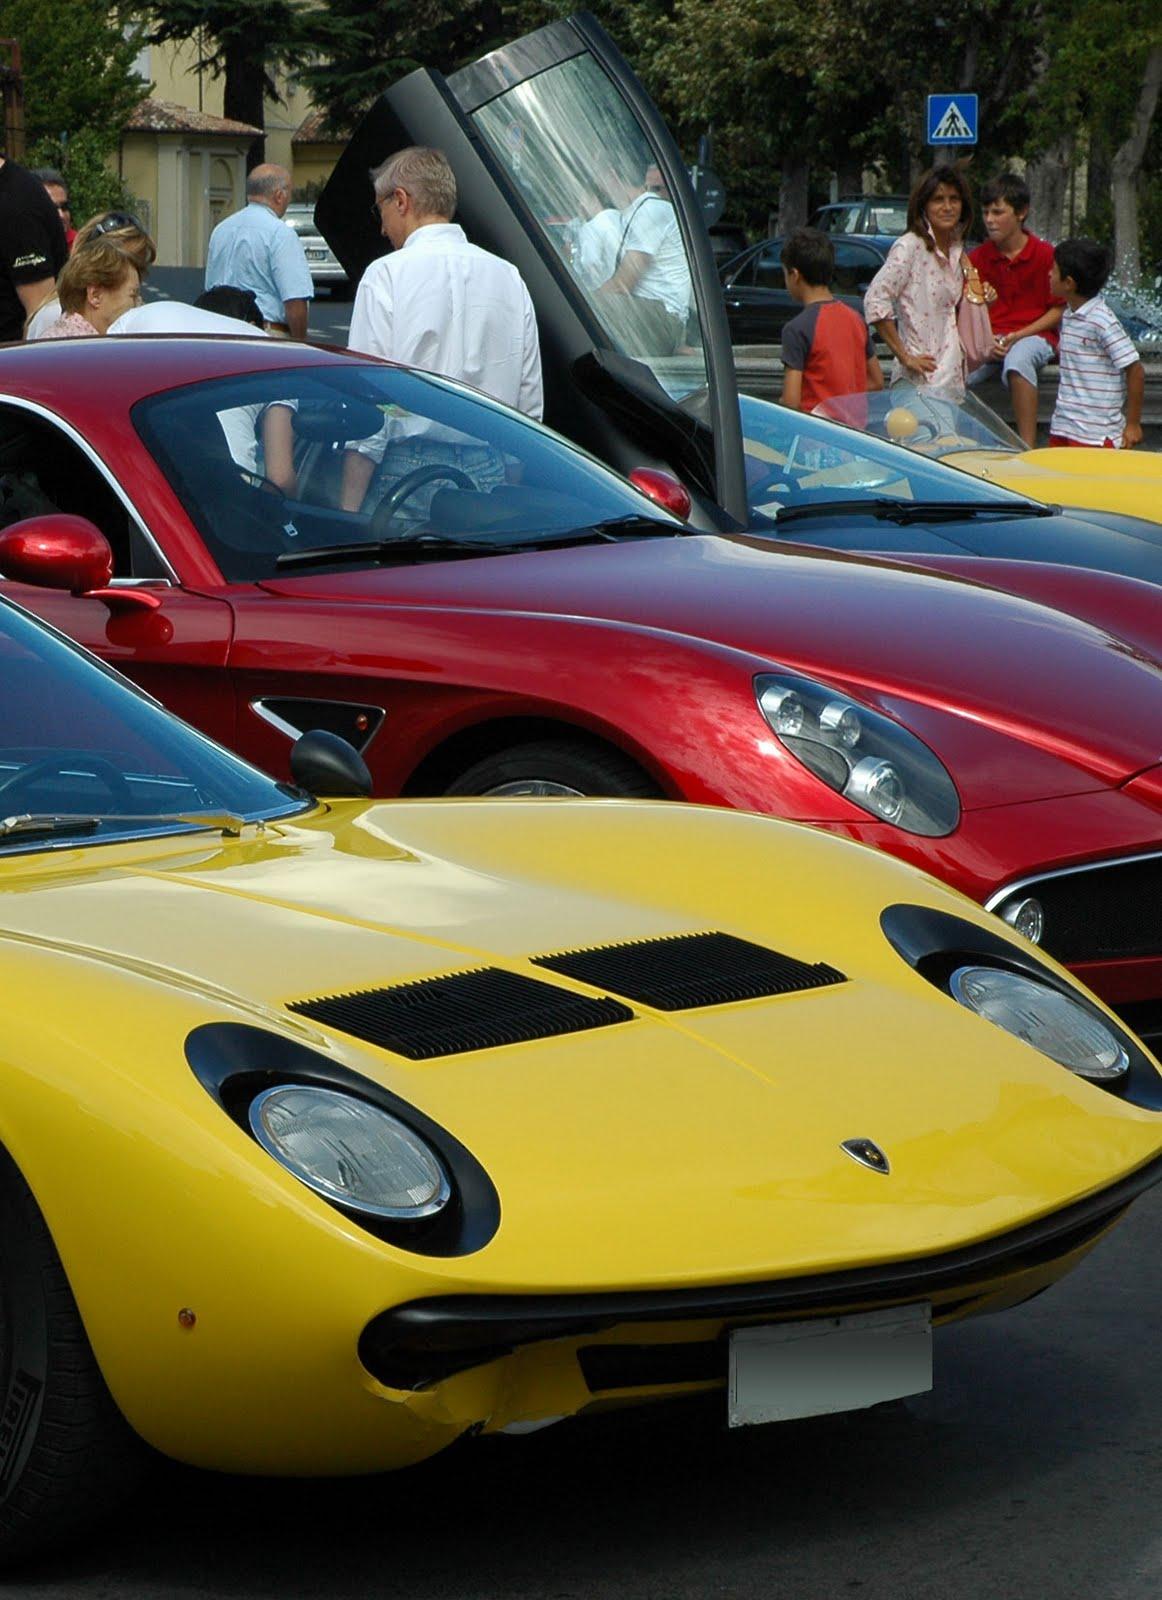 vincitore fu Enzo Ferrari,